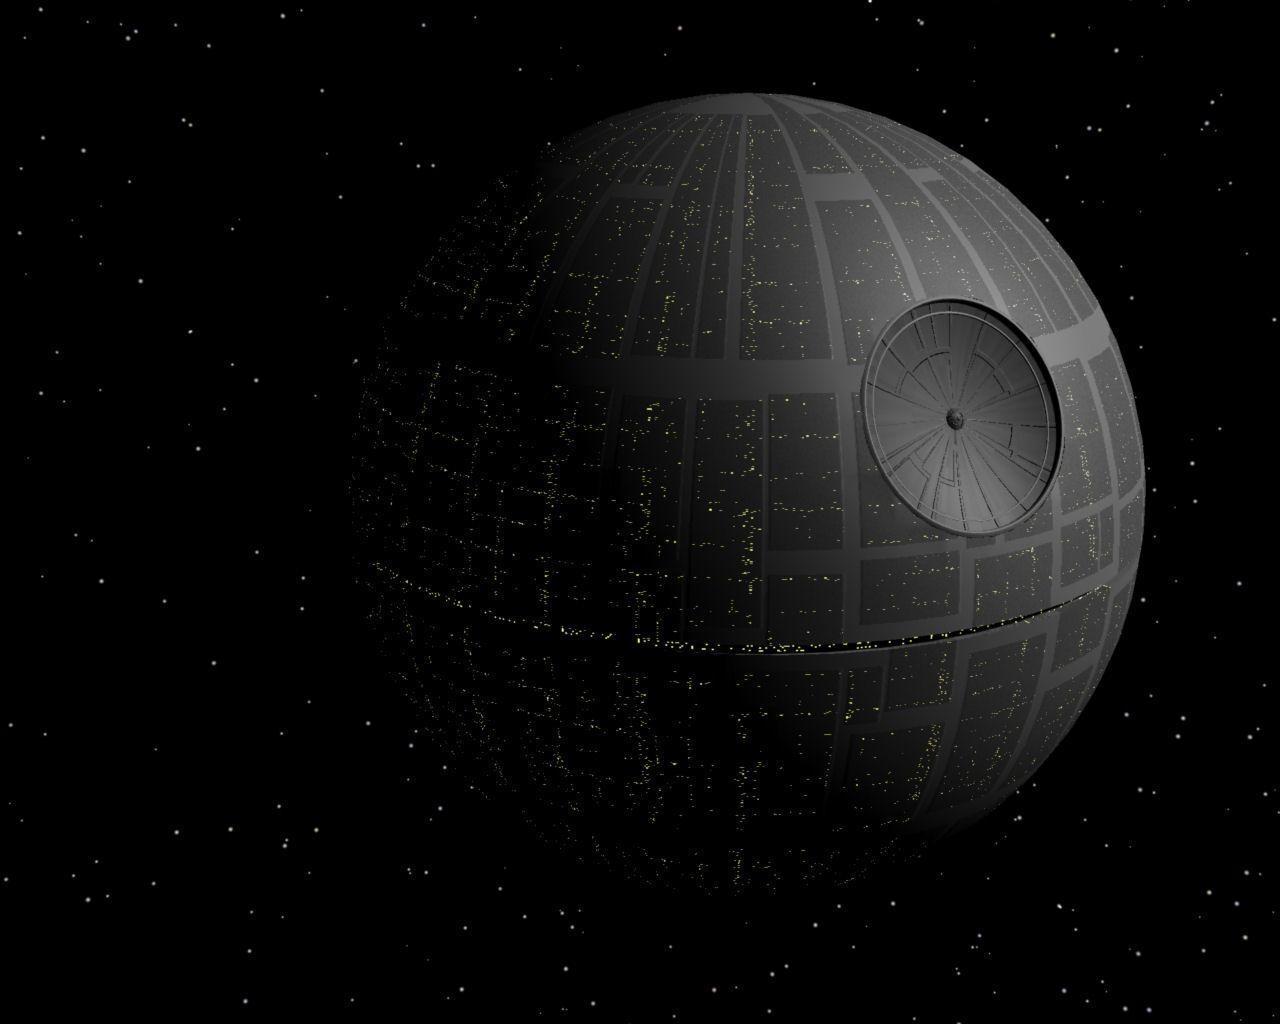 Death Star Wallpapers Hd Wallpaper Cave